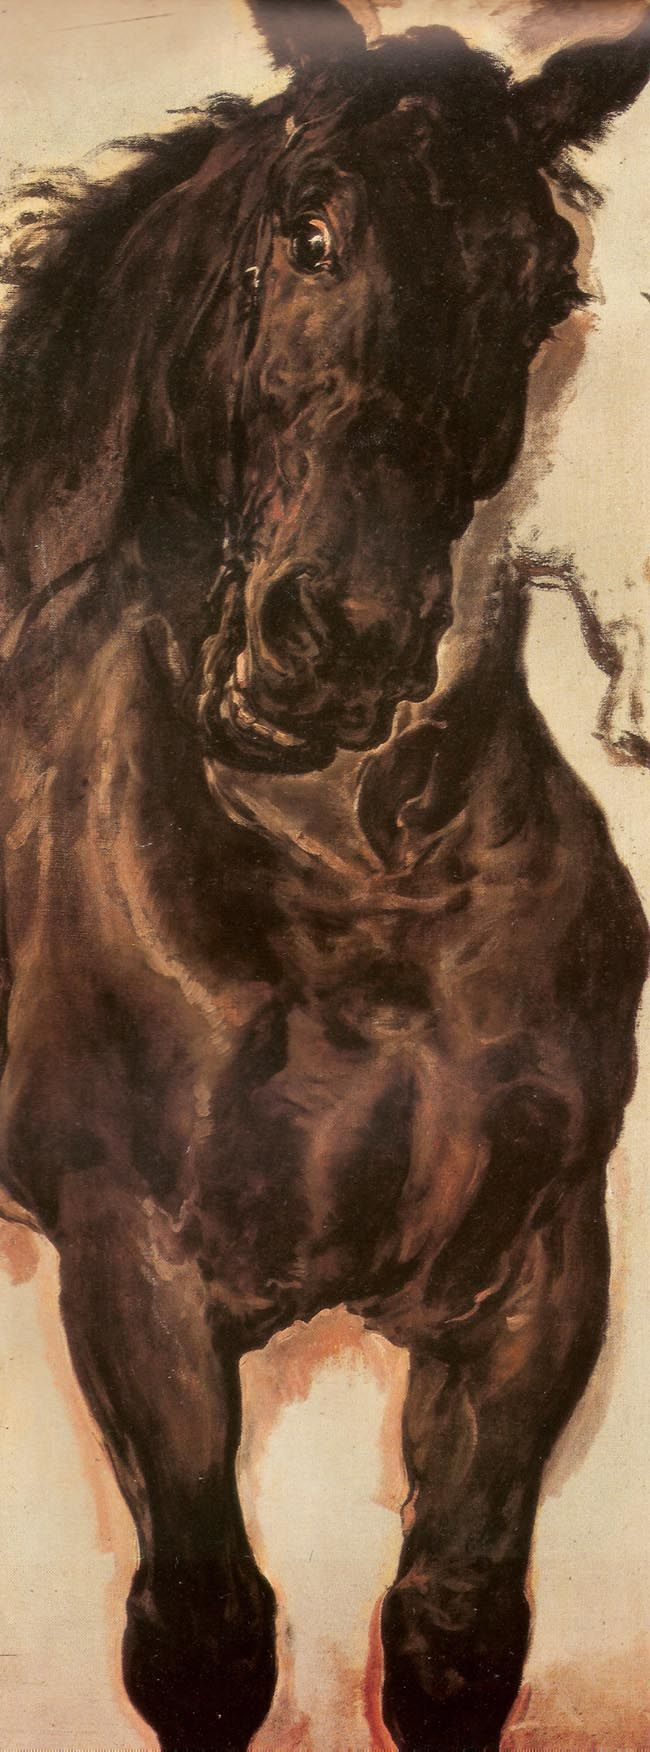 Jan Matejko (Polish, 1838-1893) - Horse Study, 1875 - National Museum, Warsaw